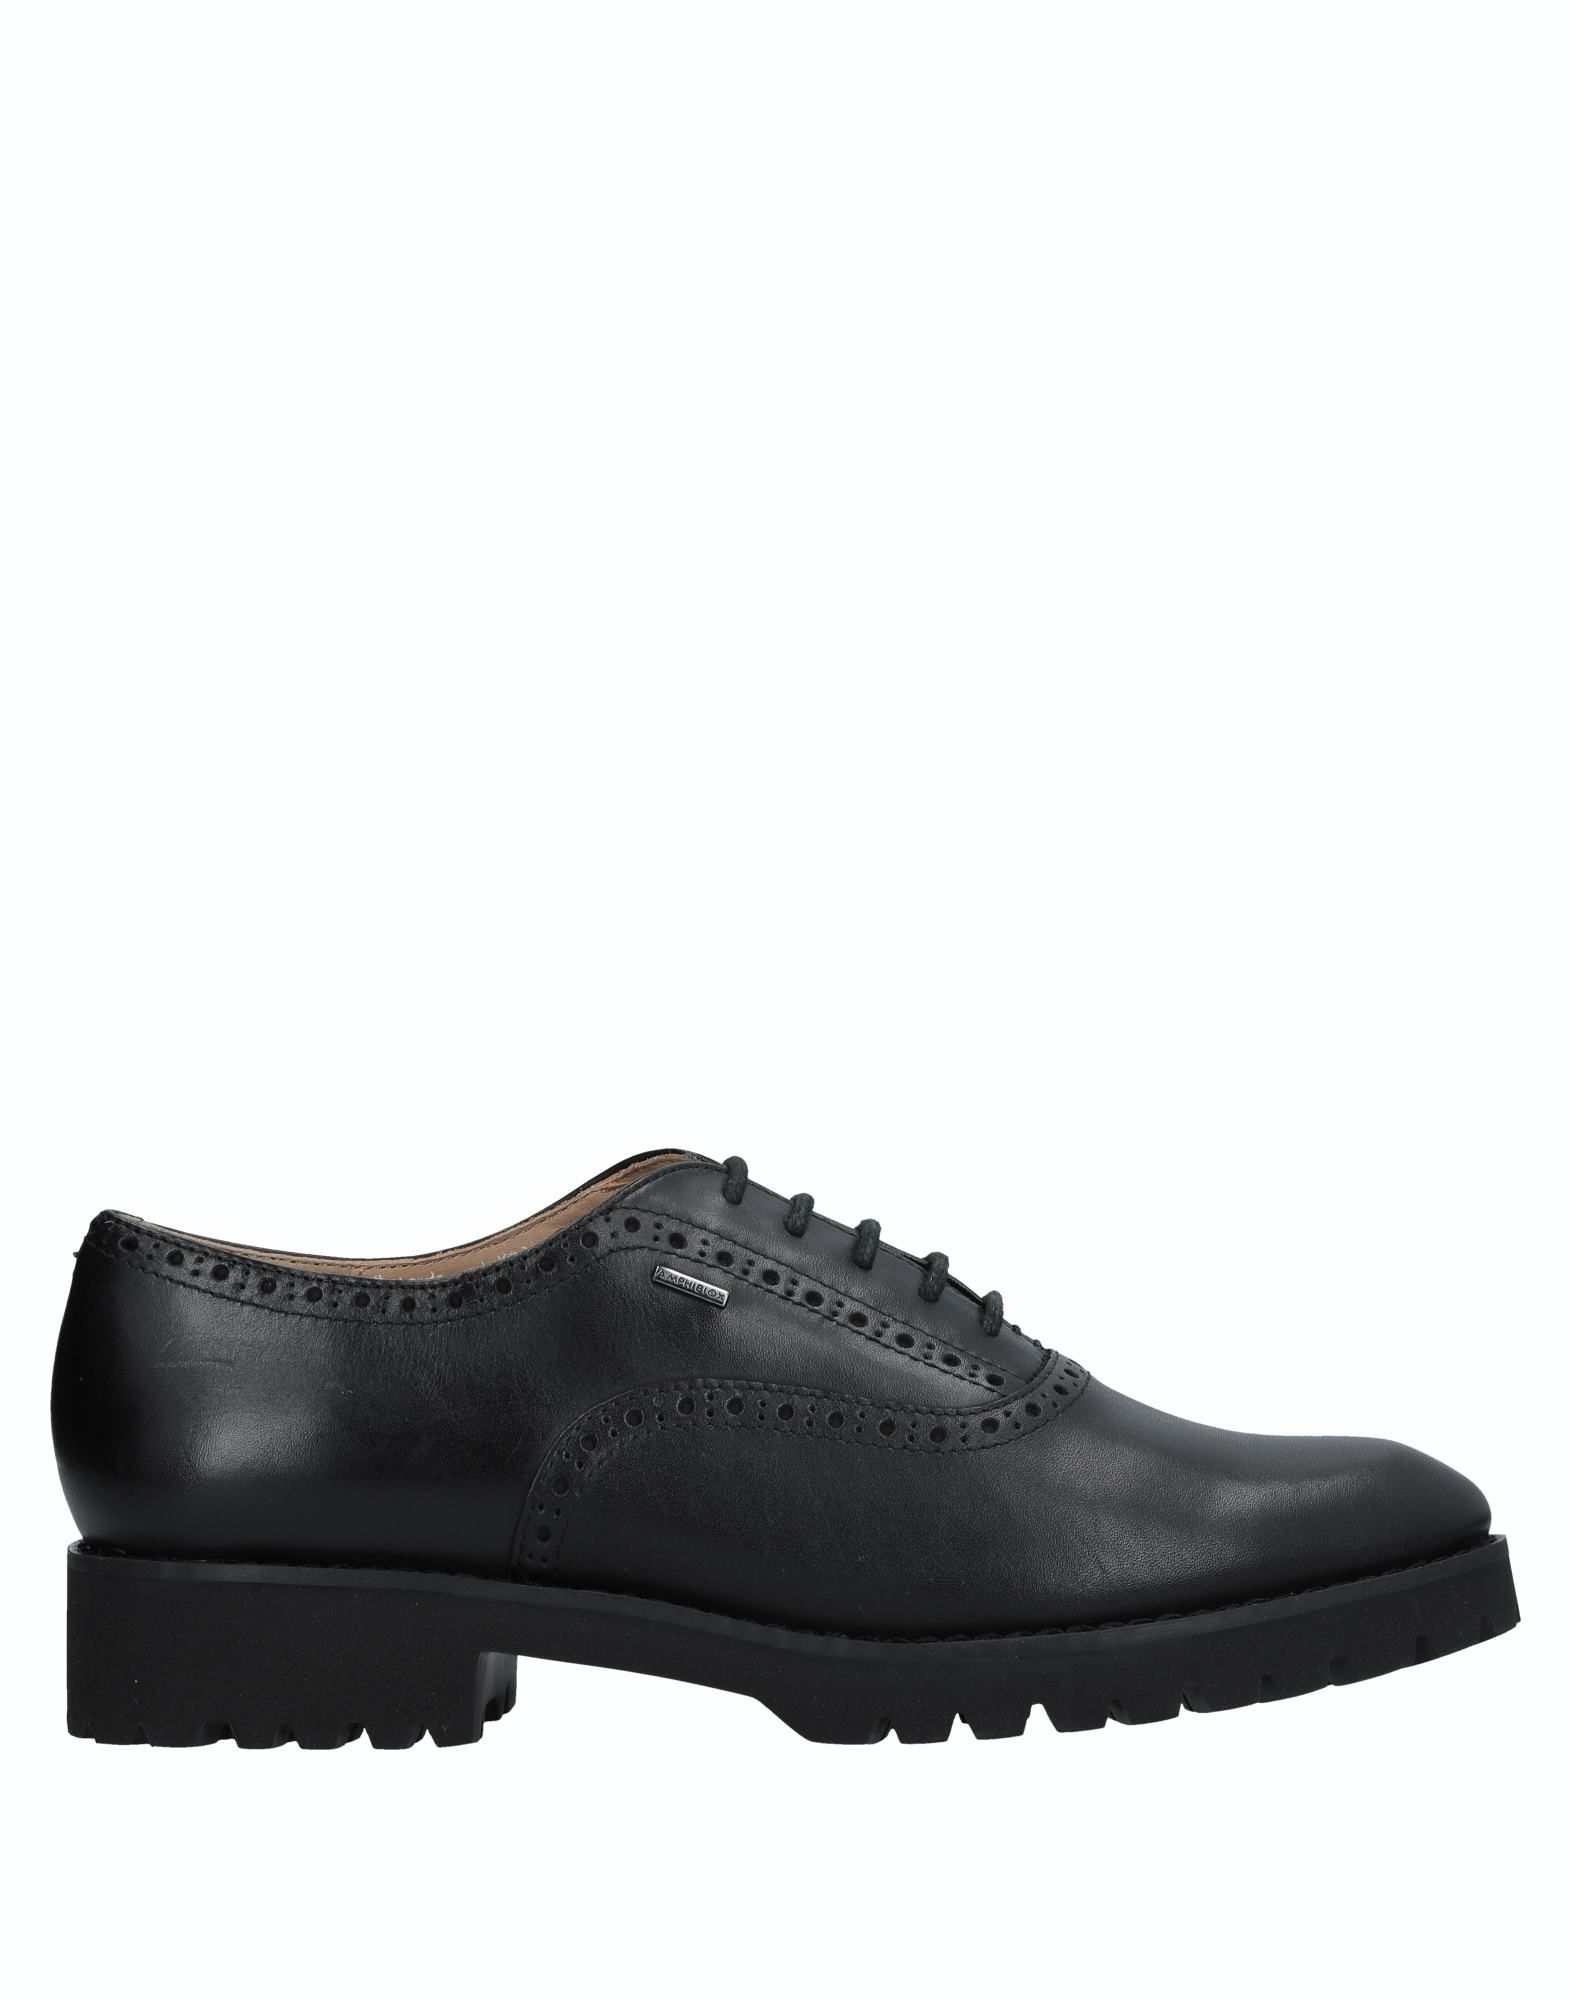 GEOX Обувь на шнурках обувь ламода